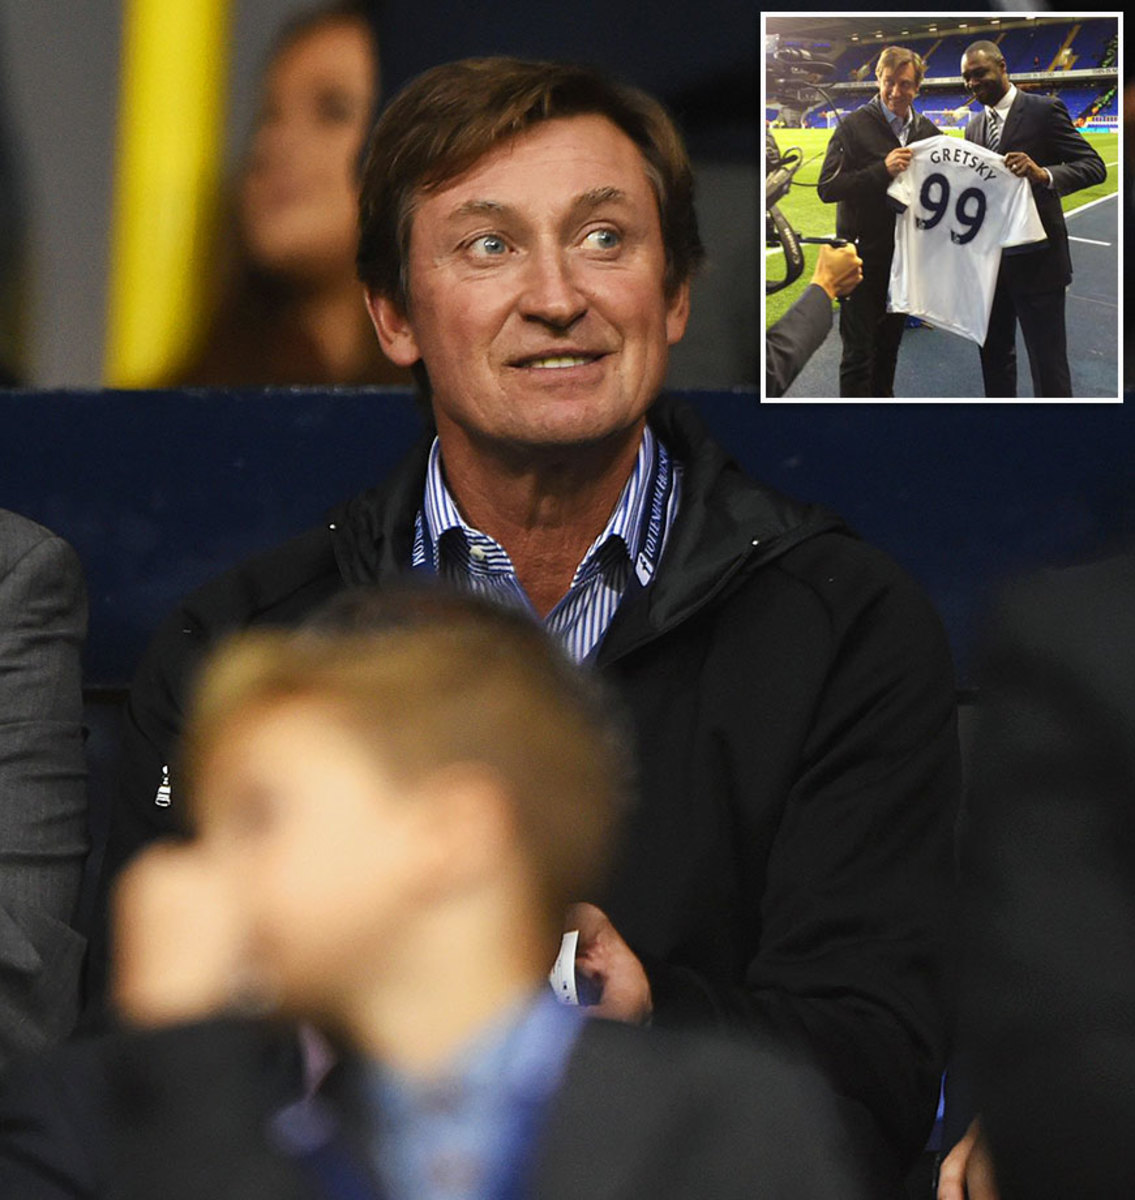 2015-1005-Wayne-Gretzky-misspelled-jersey.jpg